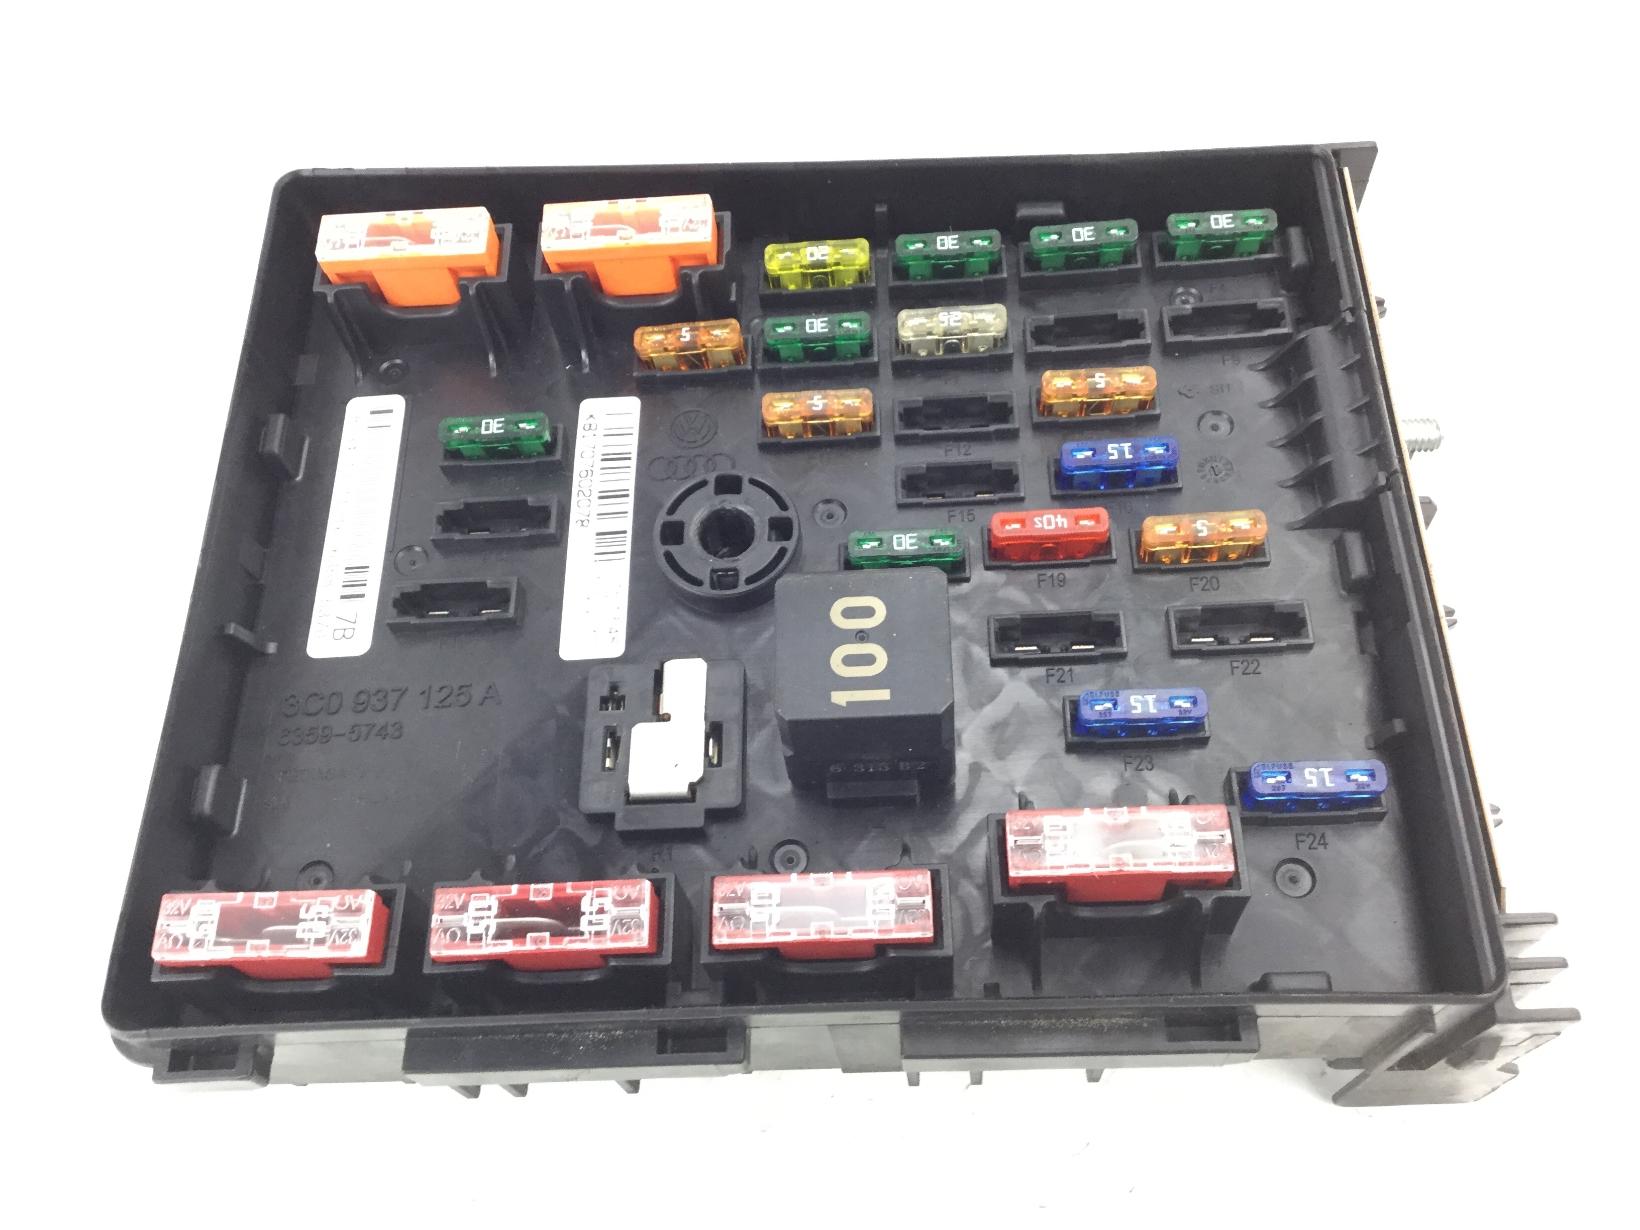 volkswagen sharan fuse box - wiring diagram ill-suspension-b -  ill-suspension-b.casatecla.it  ill-suspension-b.casatecla.it